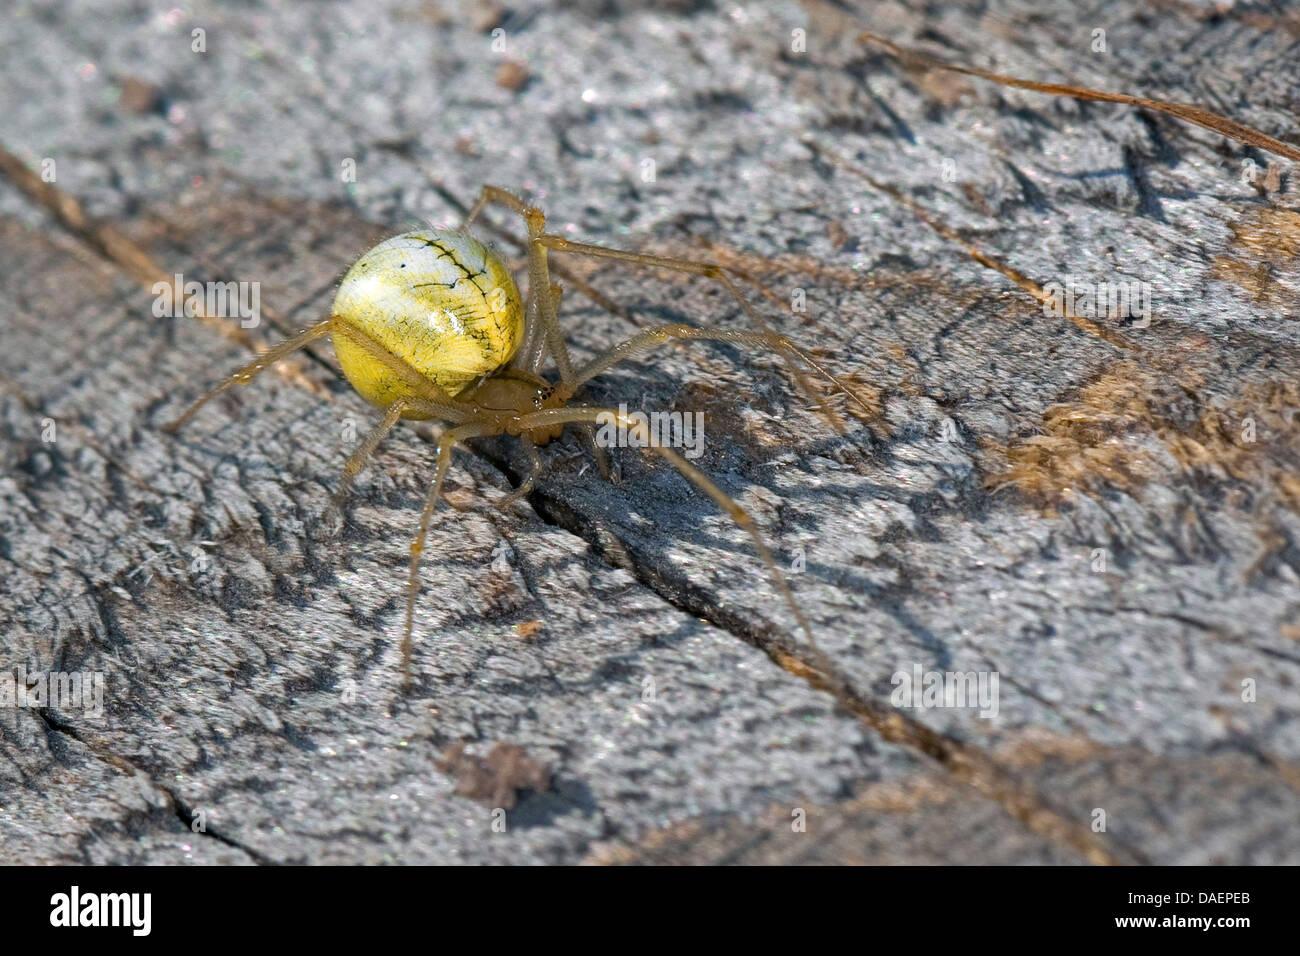 gourd spider, pumpkin spider (Araniella cucurbitina oder Araniella opistographa), sitting on bark, Germany - Stock Image